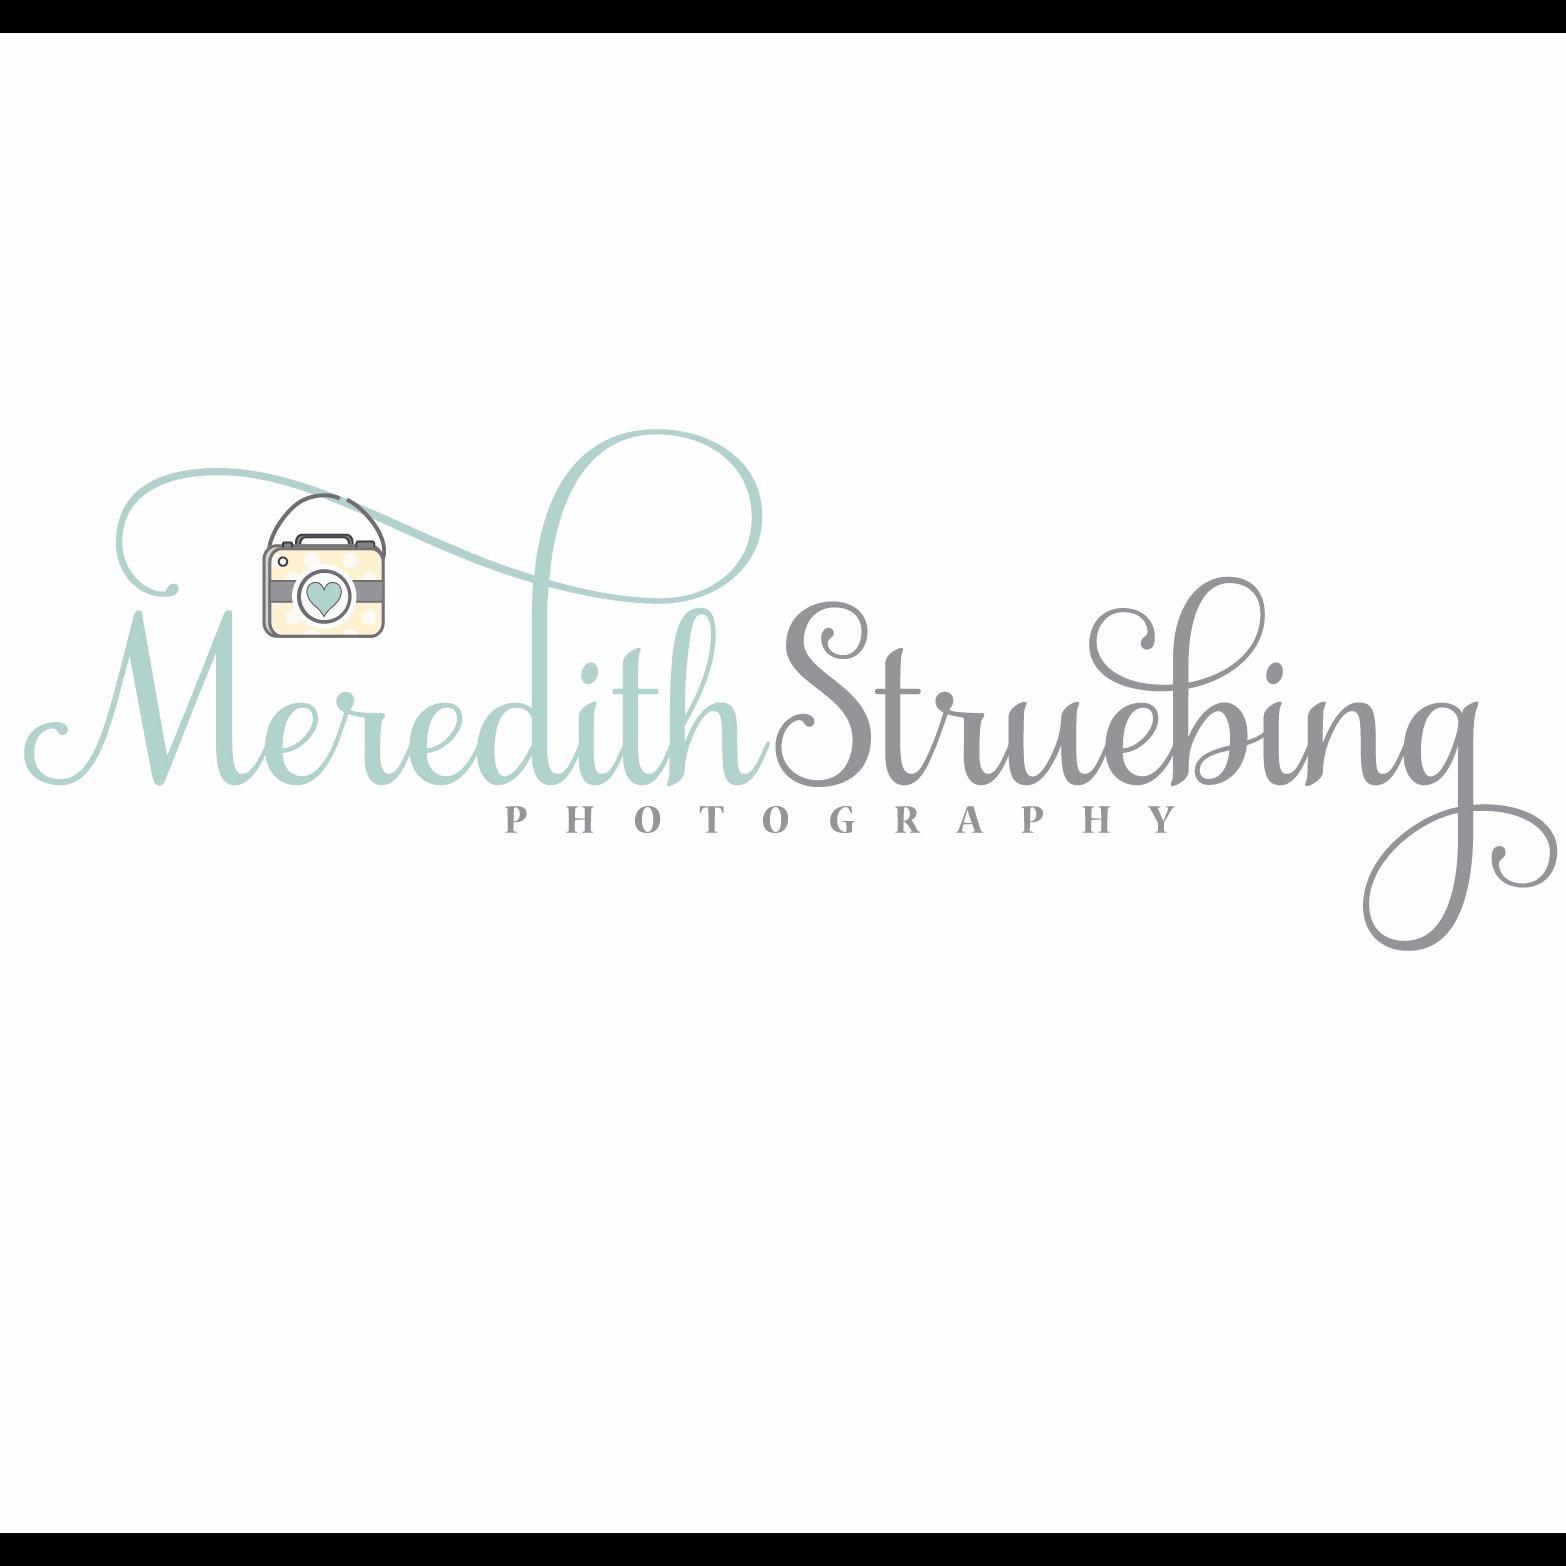 Meredith Struebing Photography